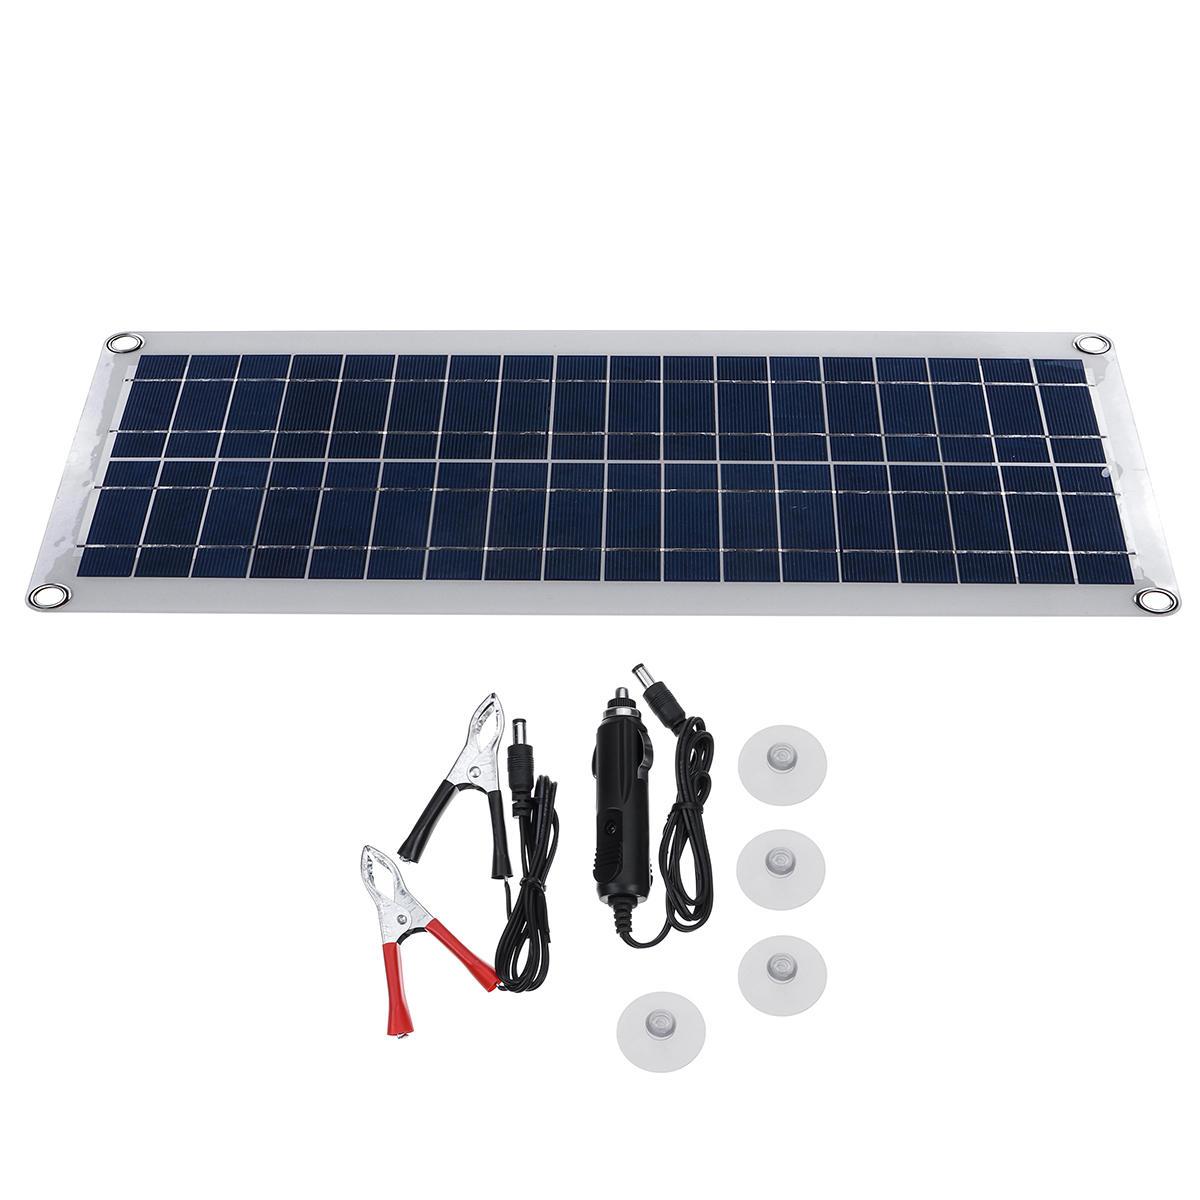 220V 500W 120000mAh 12V Portable Solar Powered System Generator Pure Sine Wave Emergency Backup Home - 2